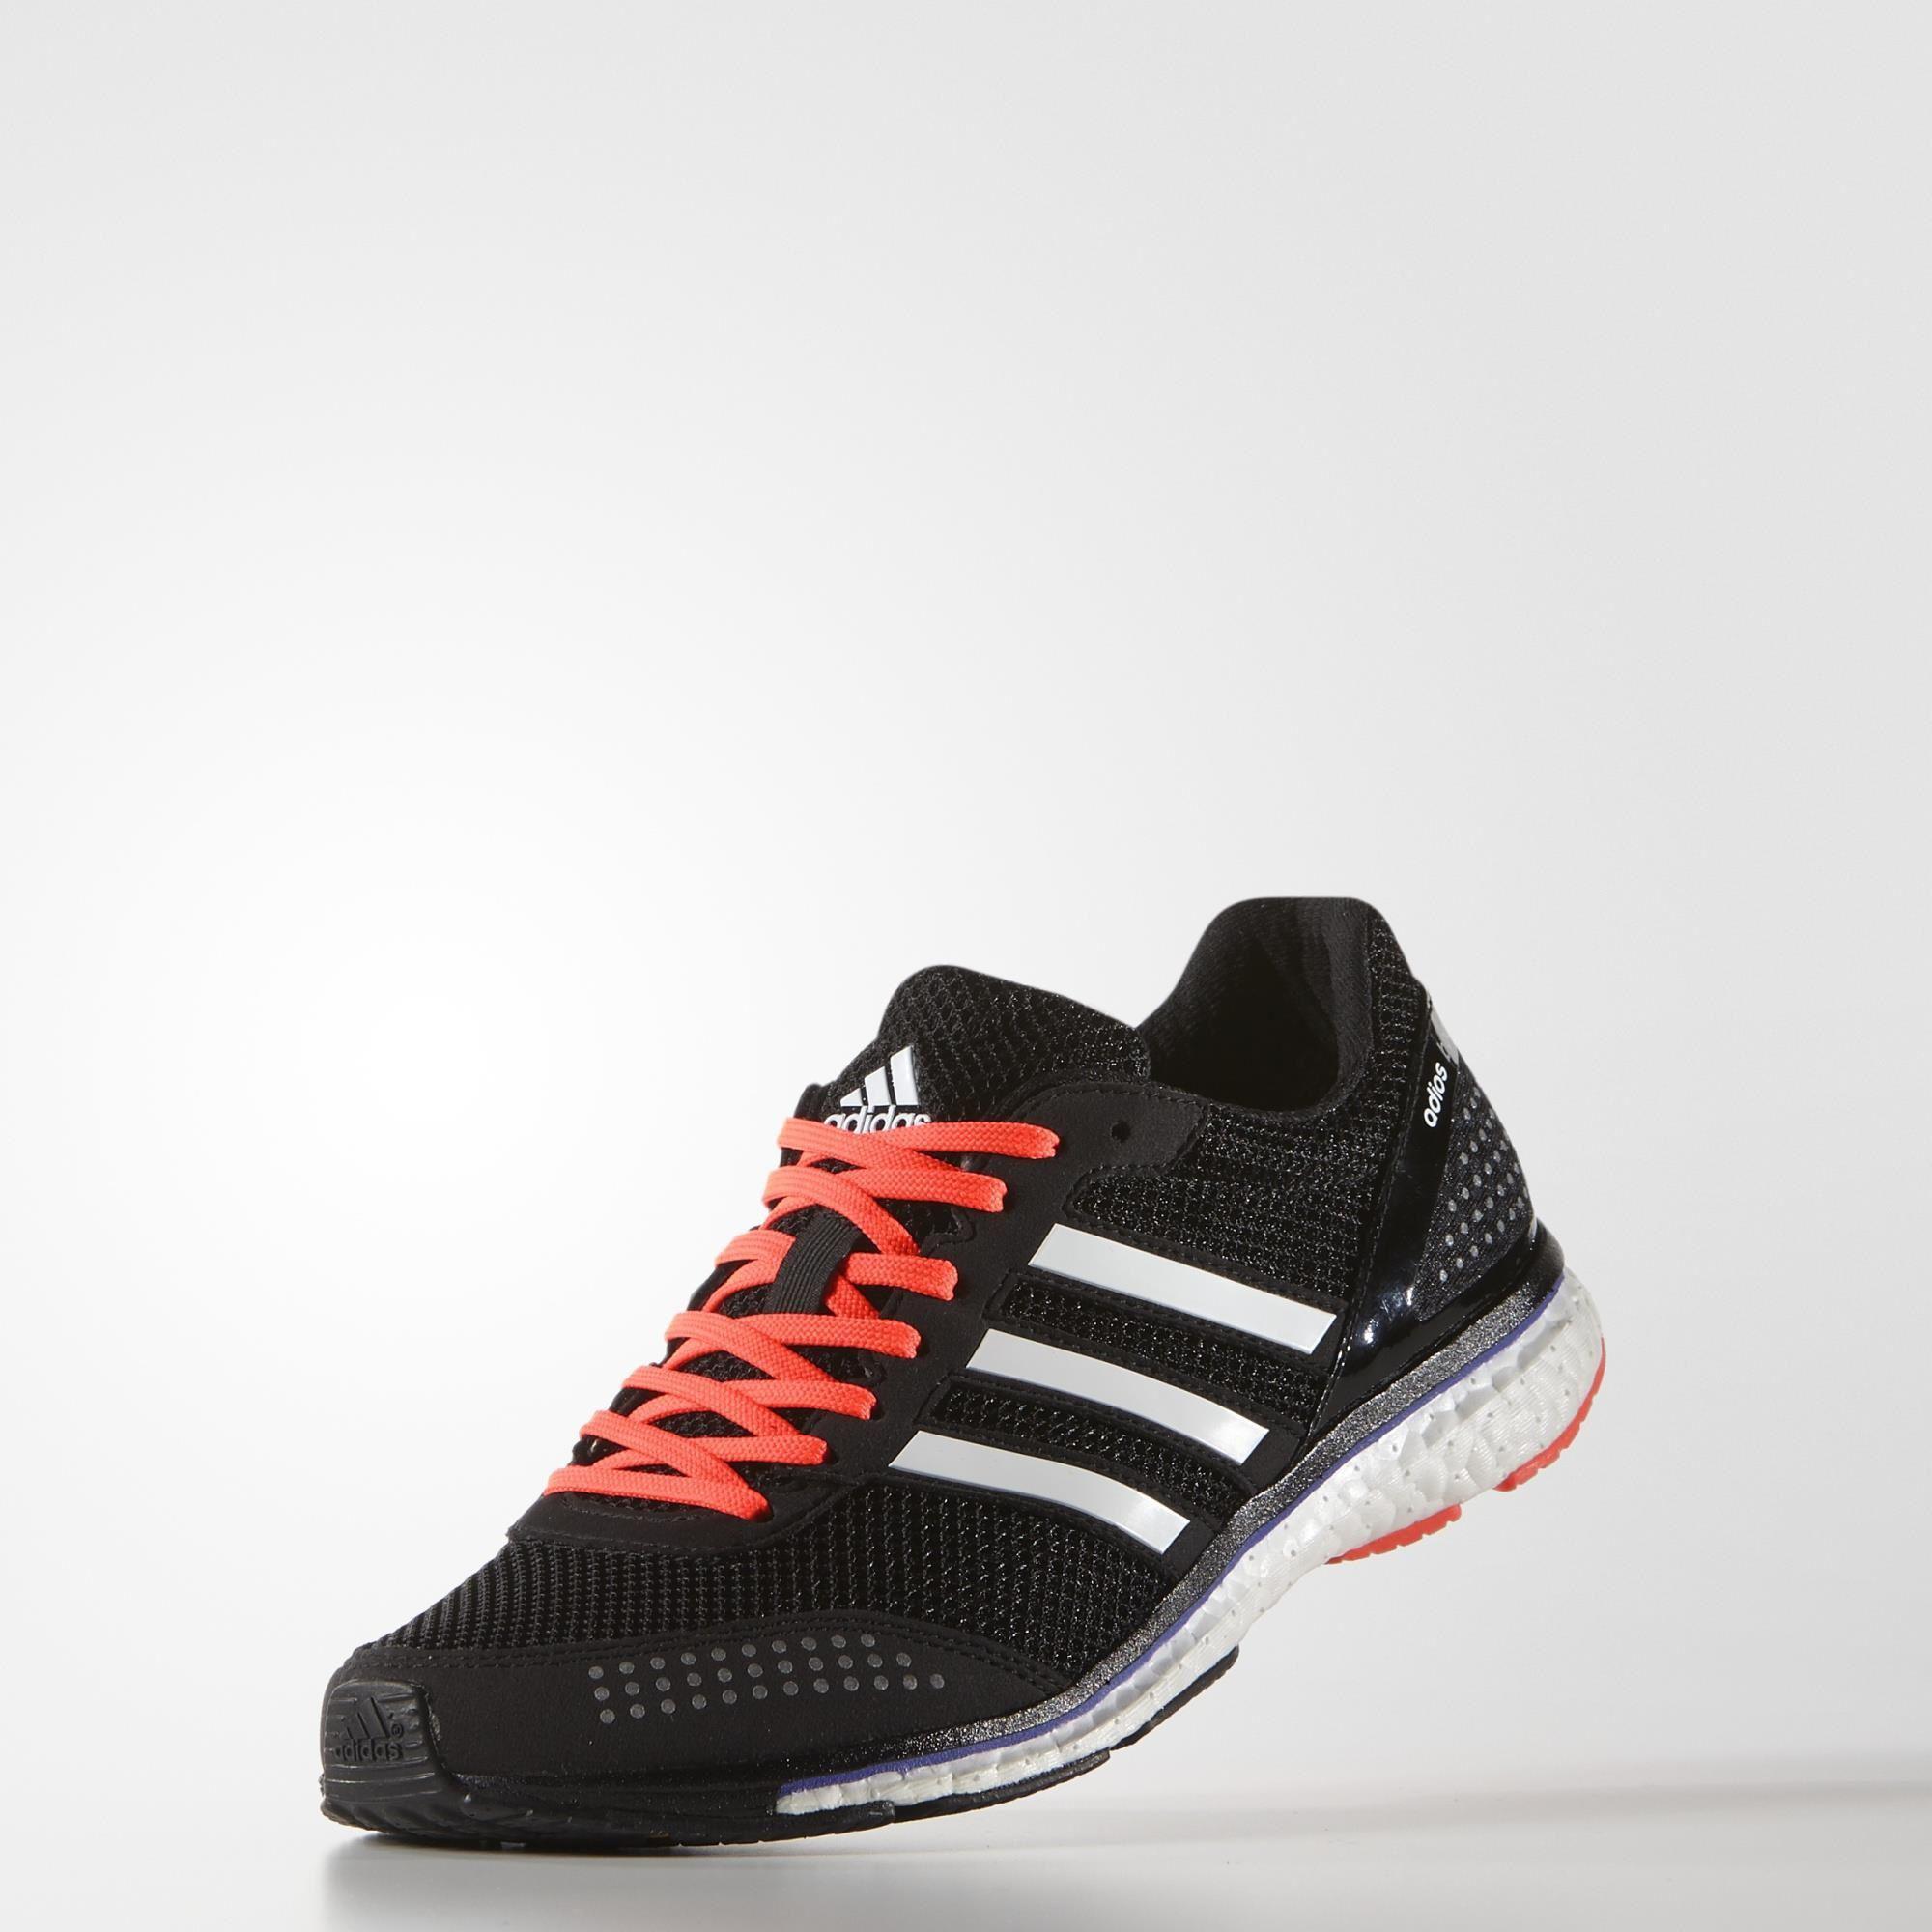 adidas womens adizero adios boost 2 0 running shoes black white. Black Bedroom Furniture Sets. Home Design Ideas